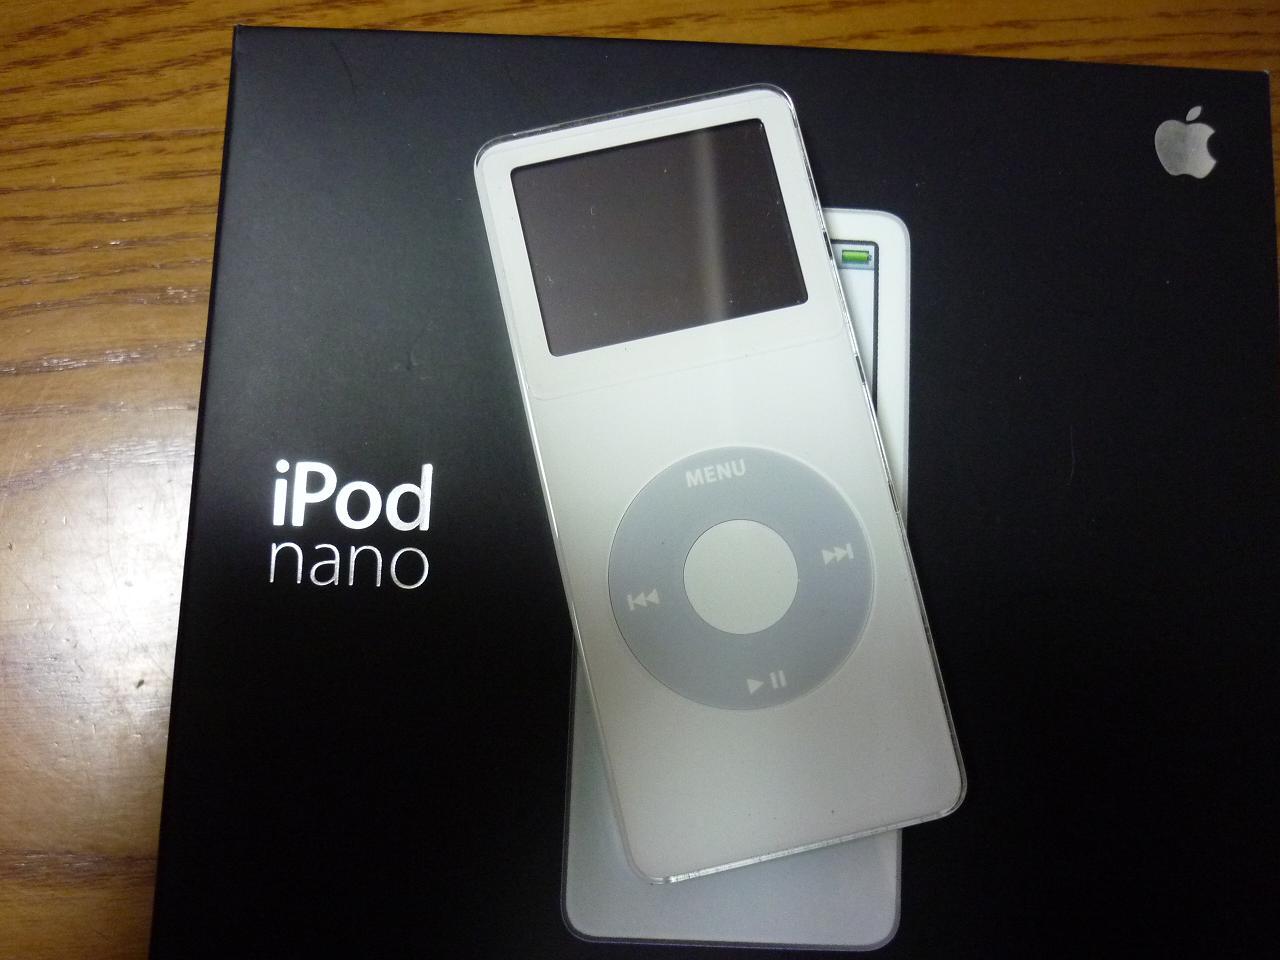 iPod nano ver1.0